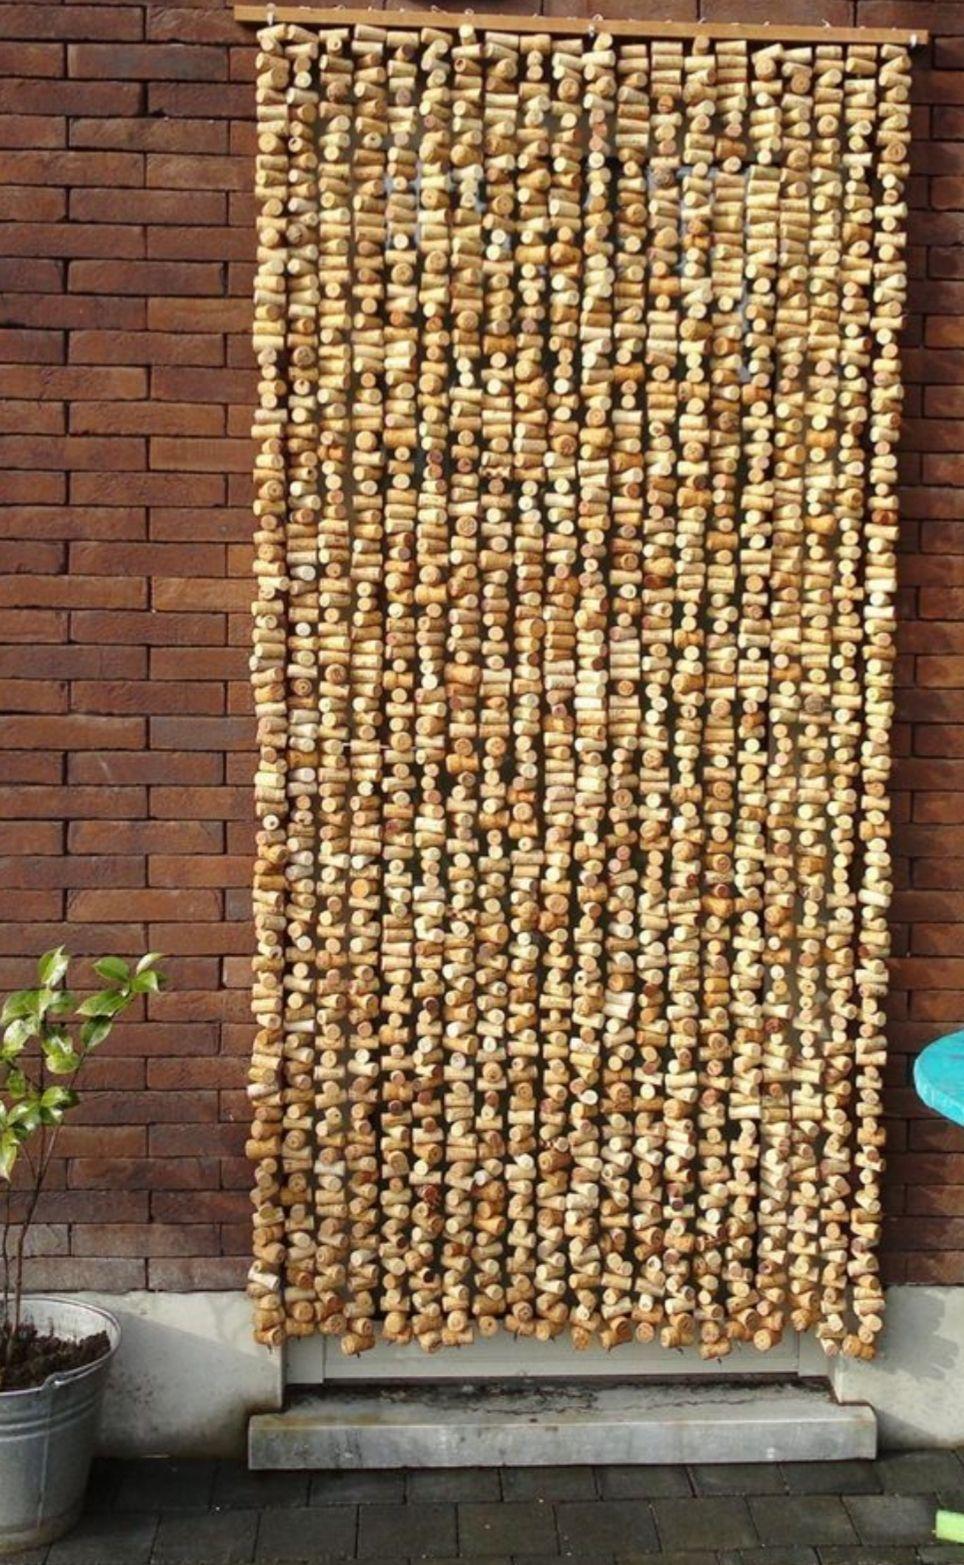 Wall Hanging Or Room Divider Wine Cork Diy Crafts Wine Cork Crafts Wine Cork Projects